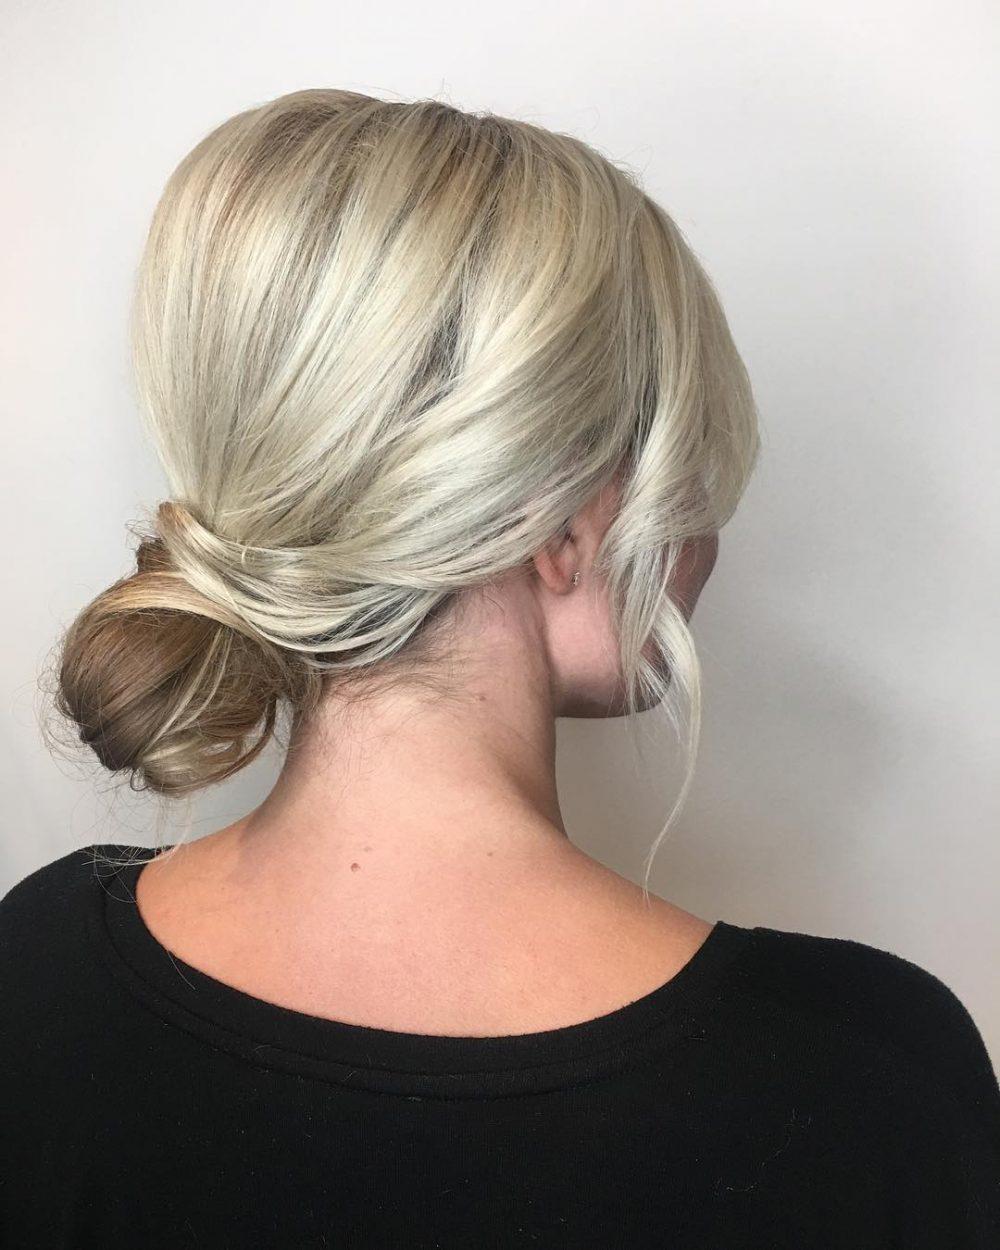 Basic Bun Upstyle hairstyle